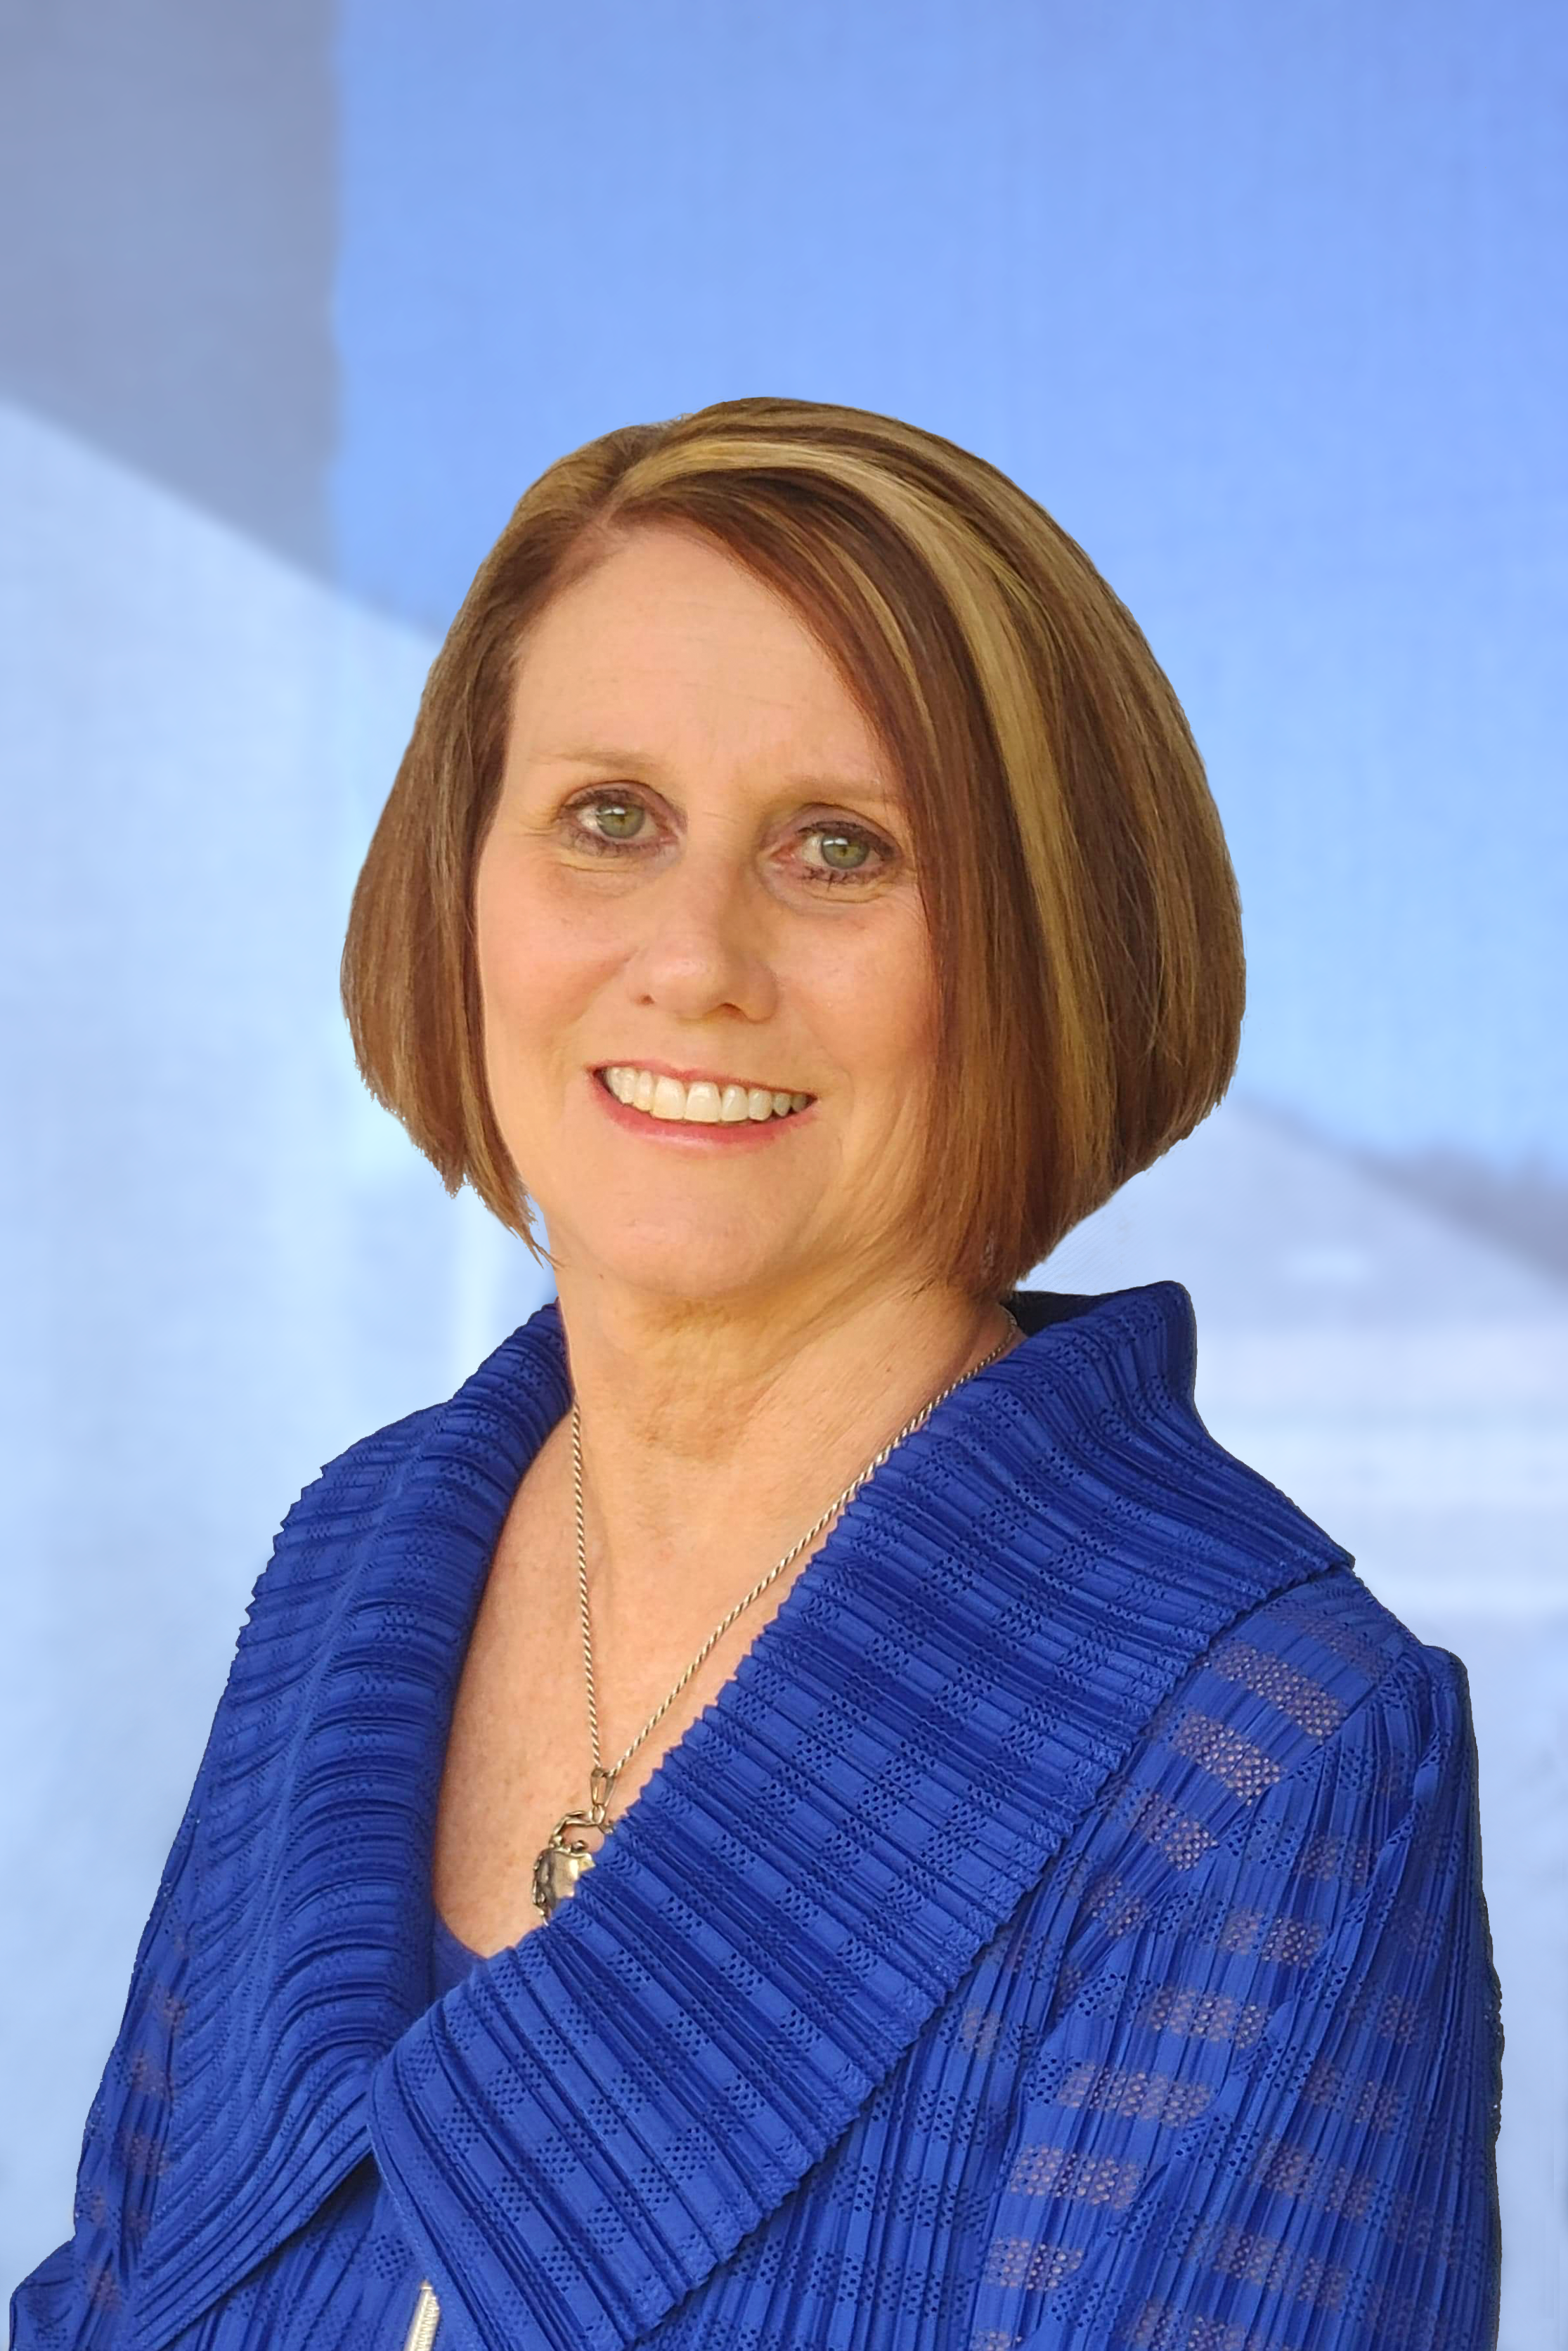 Karen Ryker, BA, CHC